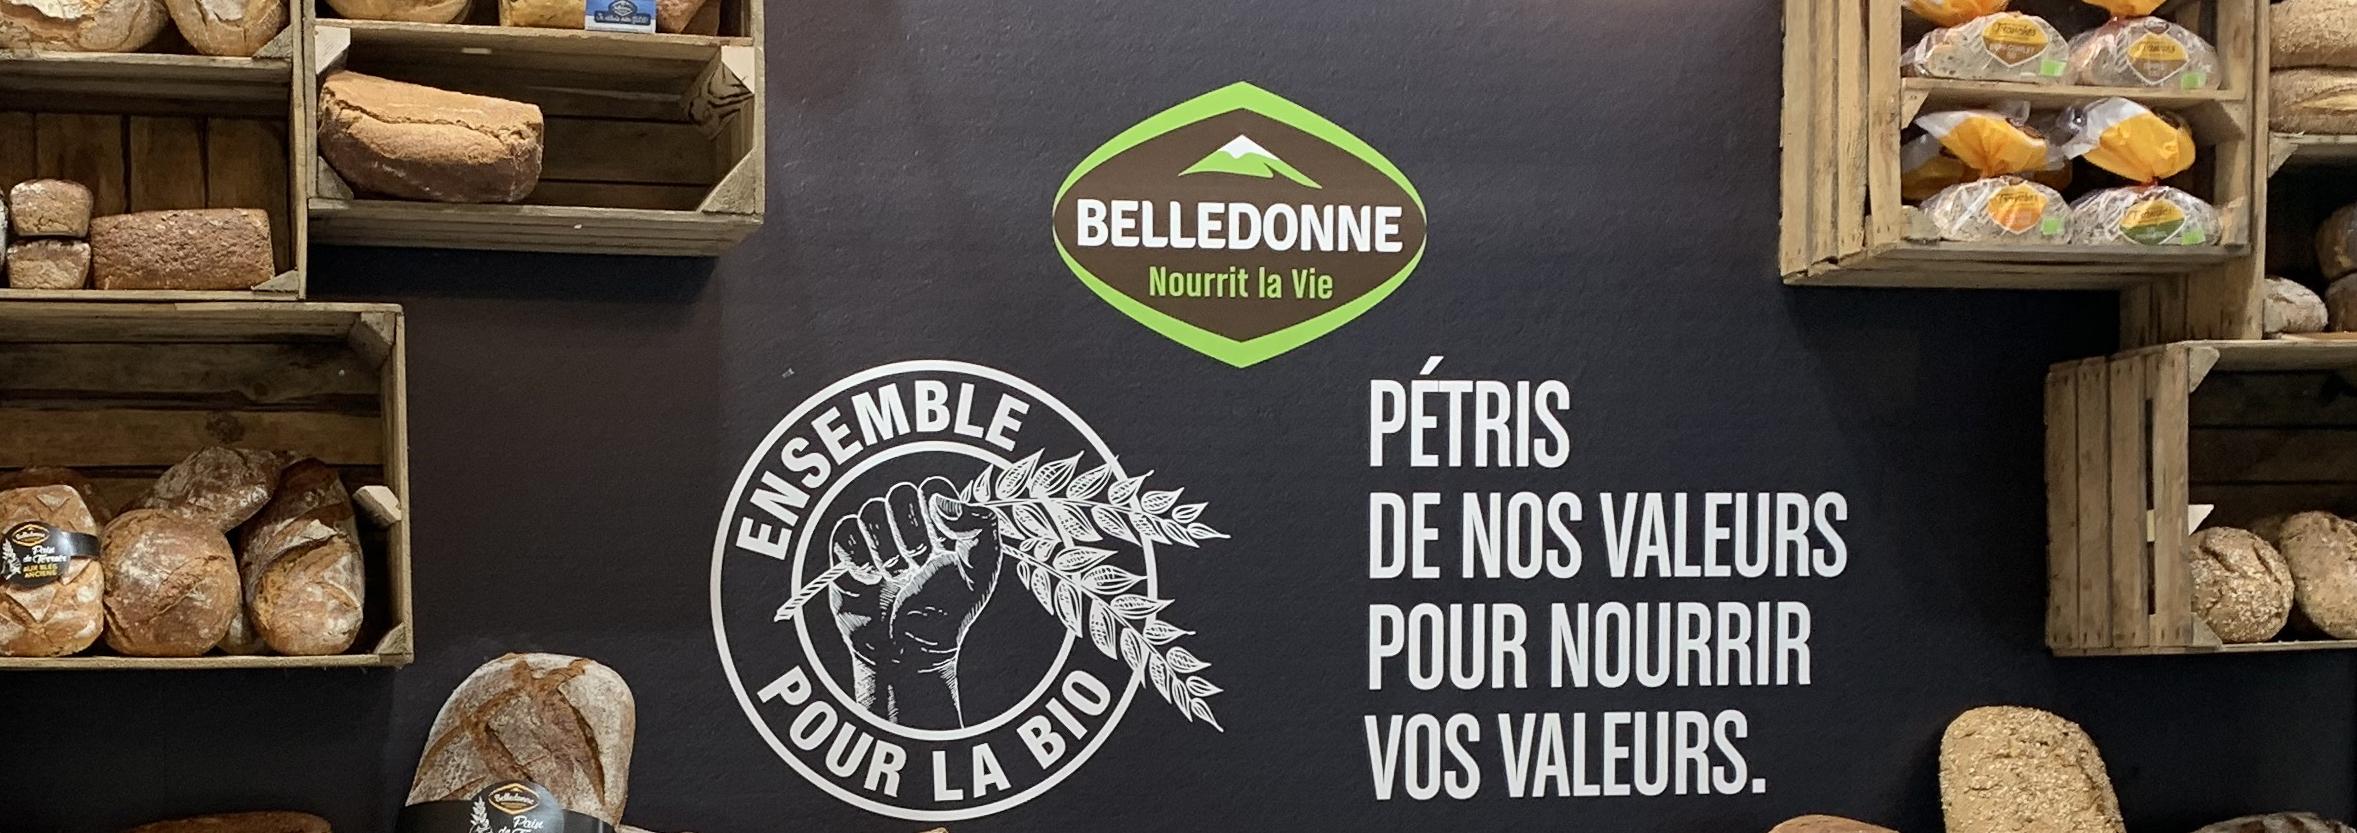 Belledonne Citation